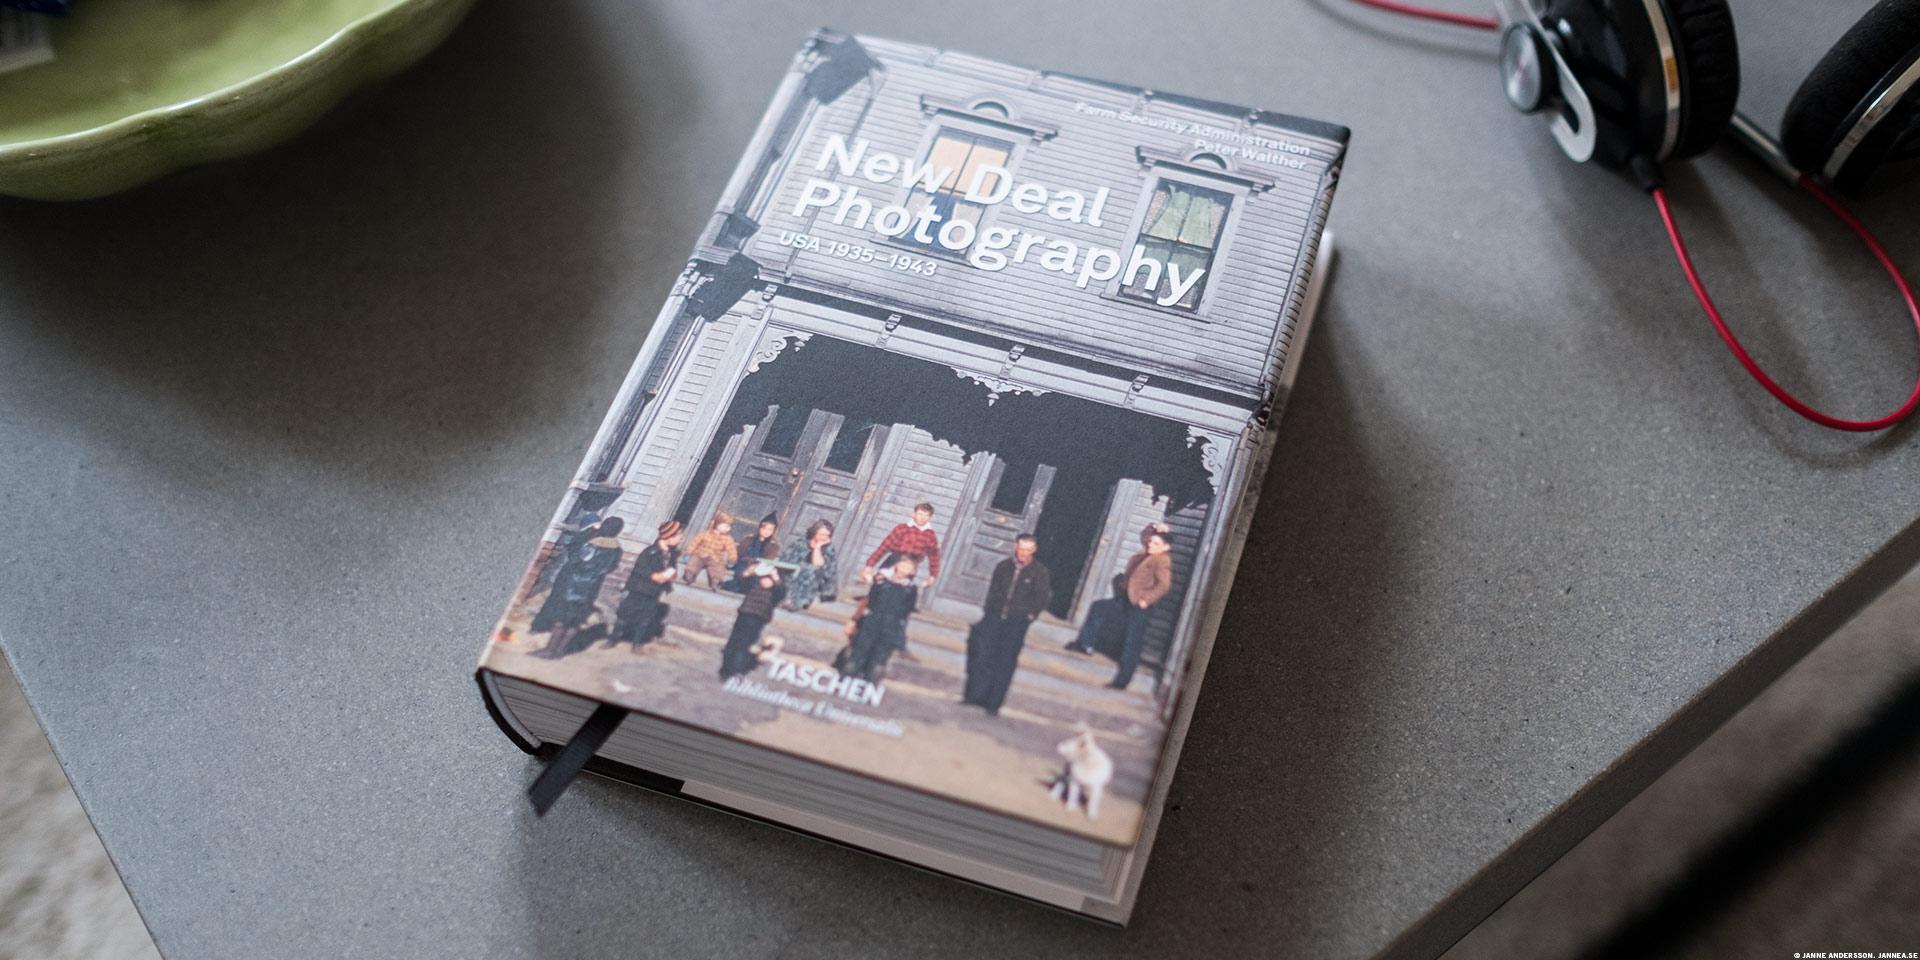 New deal photography – fotobok  ©Janne A